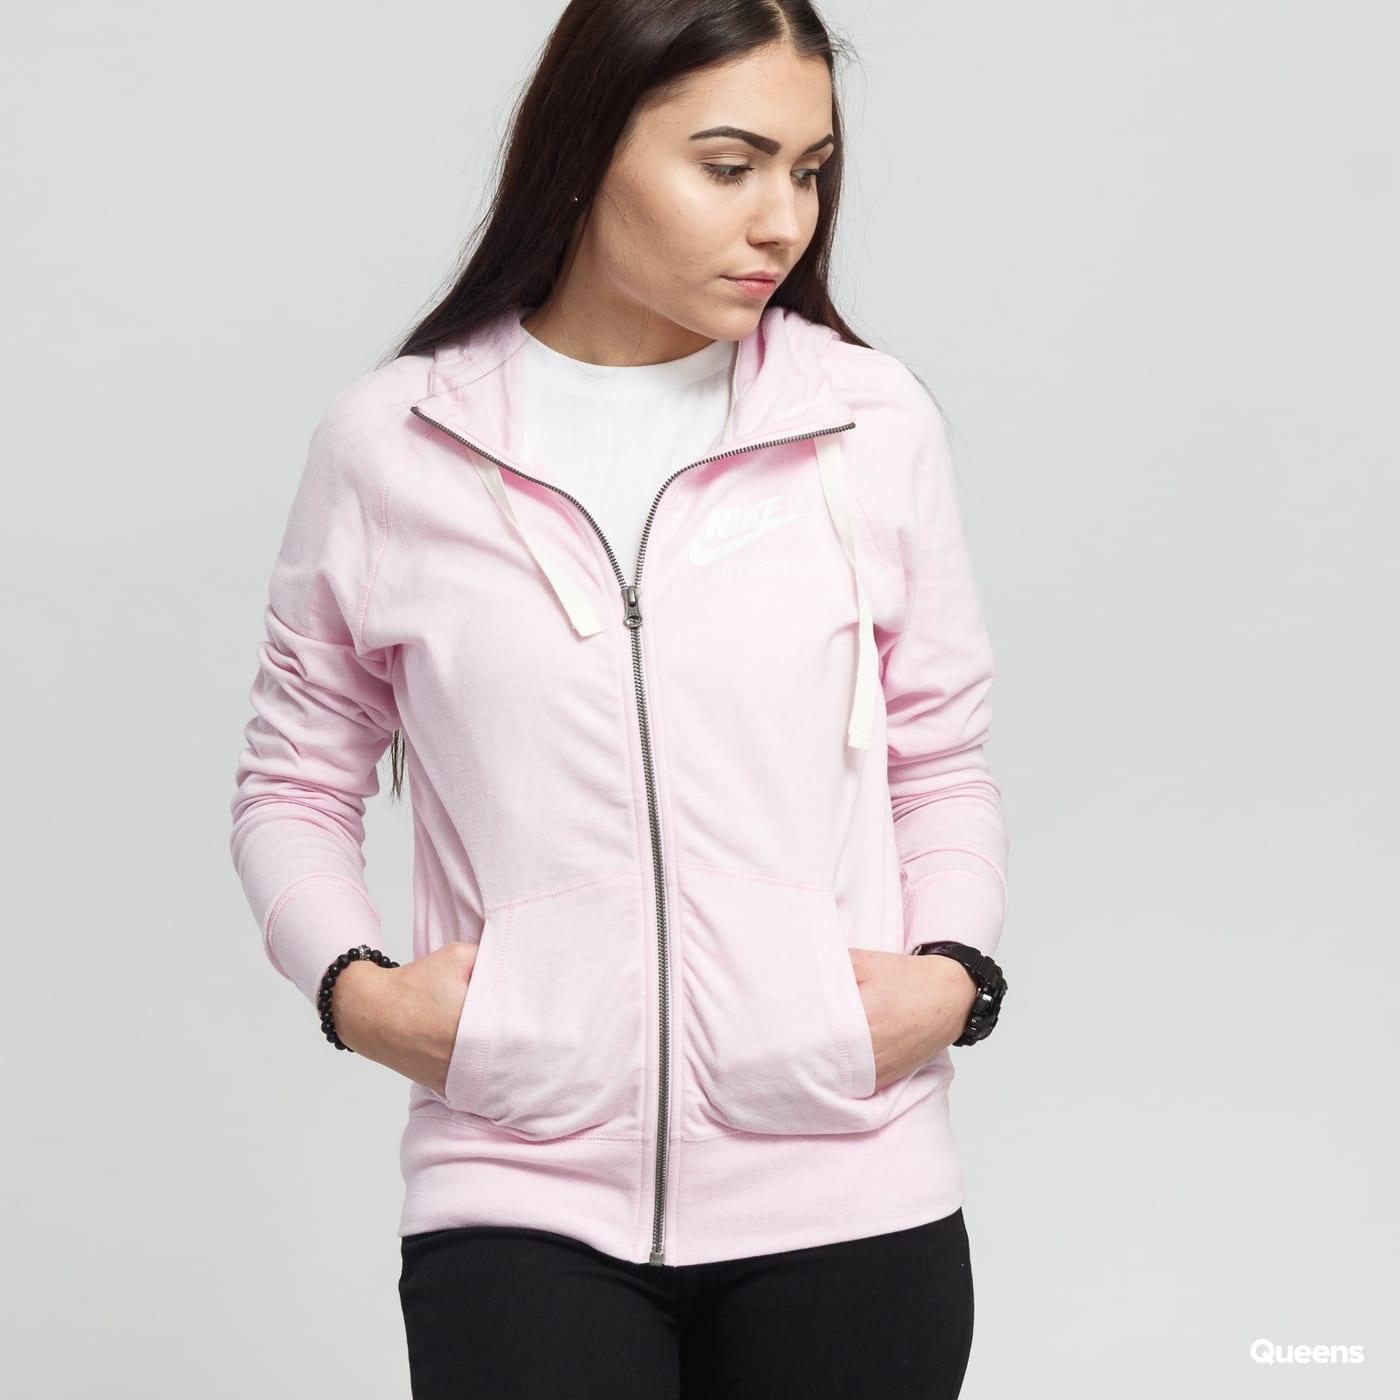 get online classic styles performance sportswear Nike W NSW Gym Vintage Hoodie FZ melange light pink